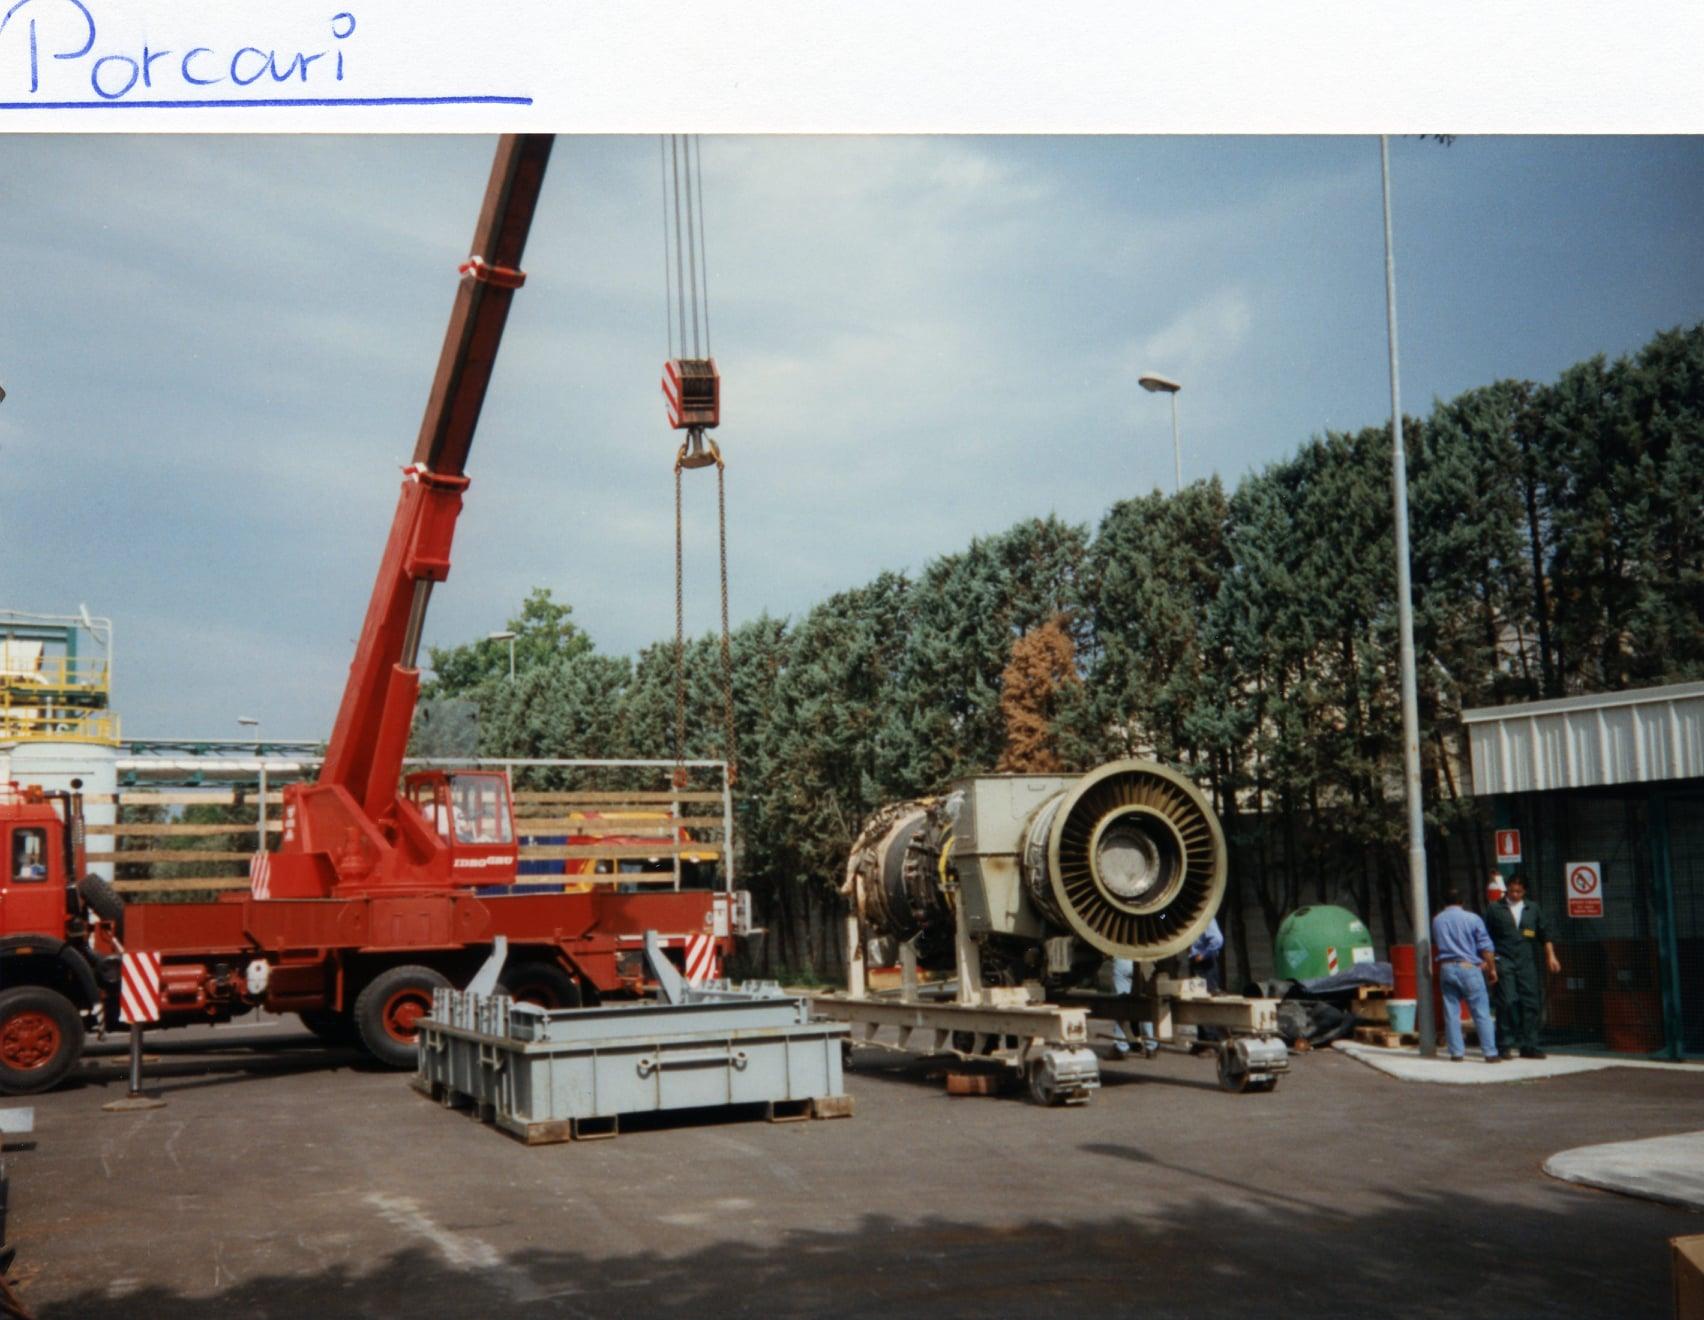 Joop-de-Jong-Vliegtuigmotor-laden-Fa-Sontel-Porcari-19-6-1997-17-ton-van-8-tot-17-uur-(3)